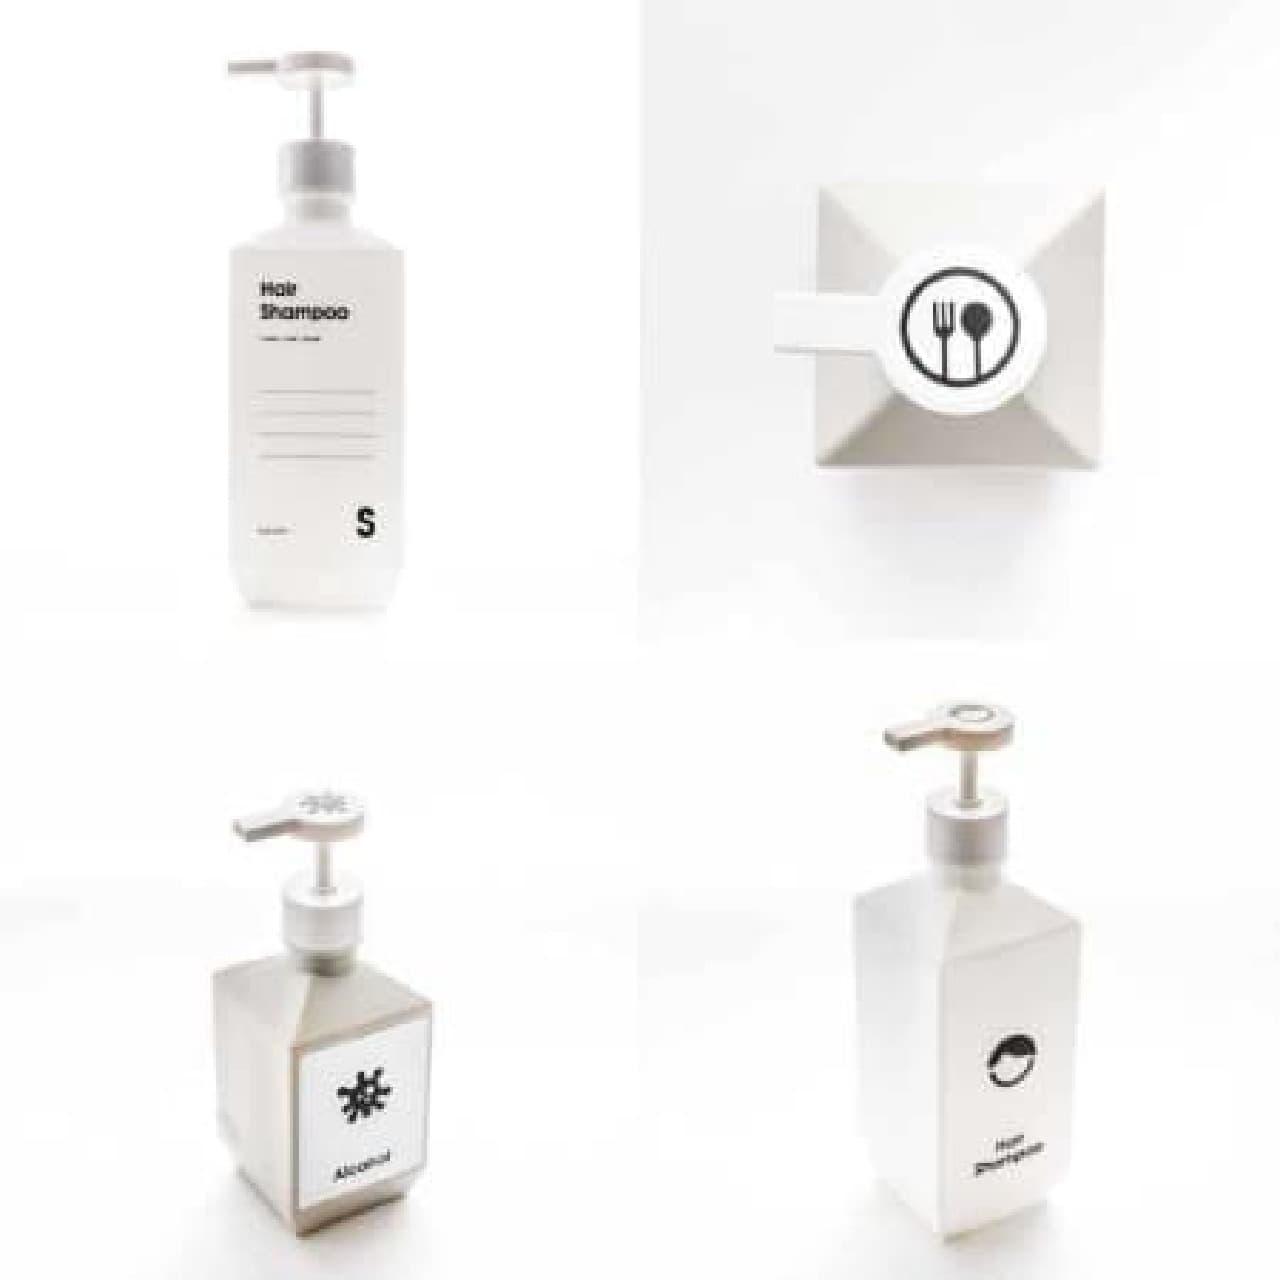 sarasa designのポンプボトル「b2c pet pump」